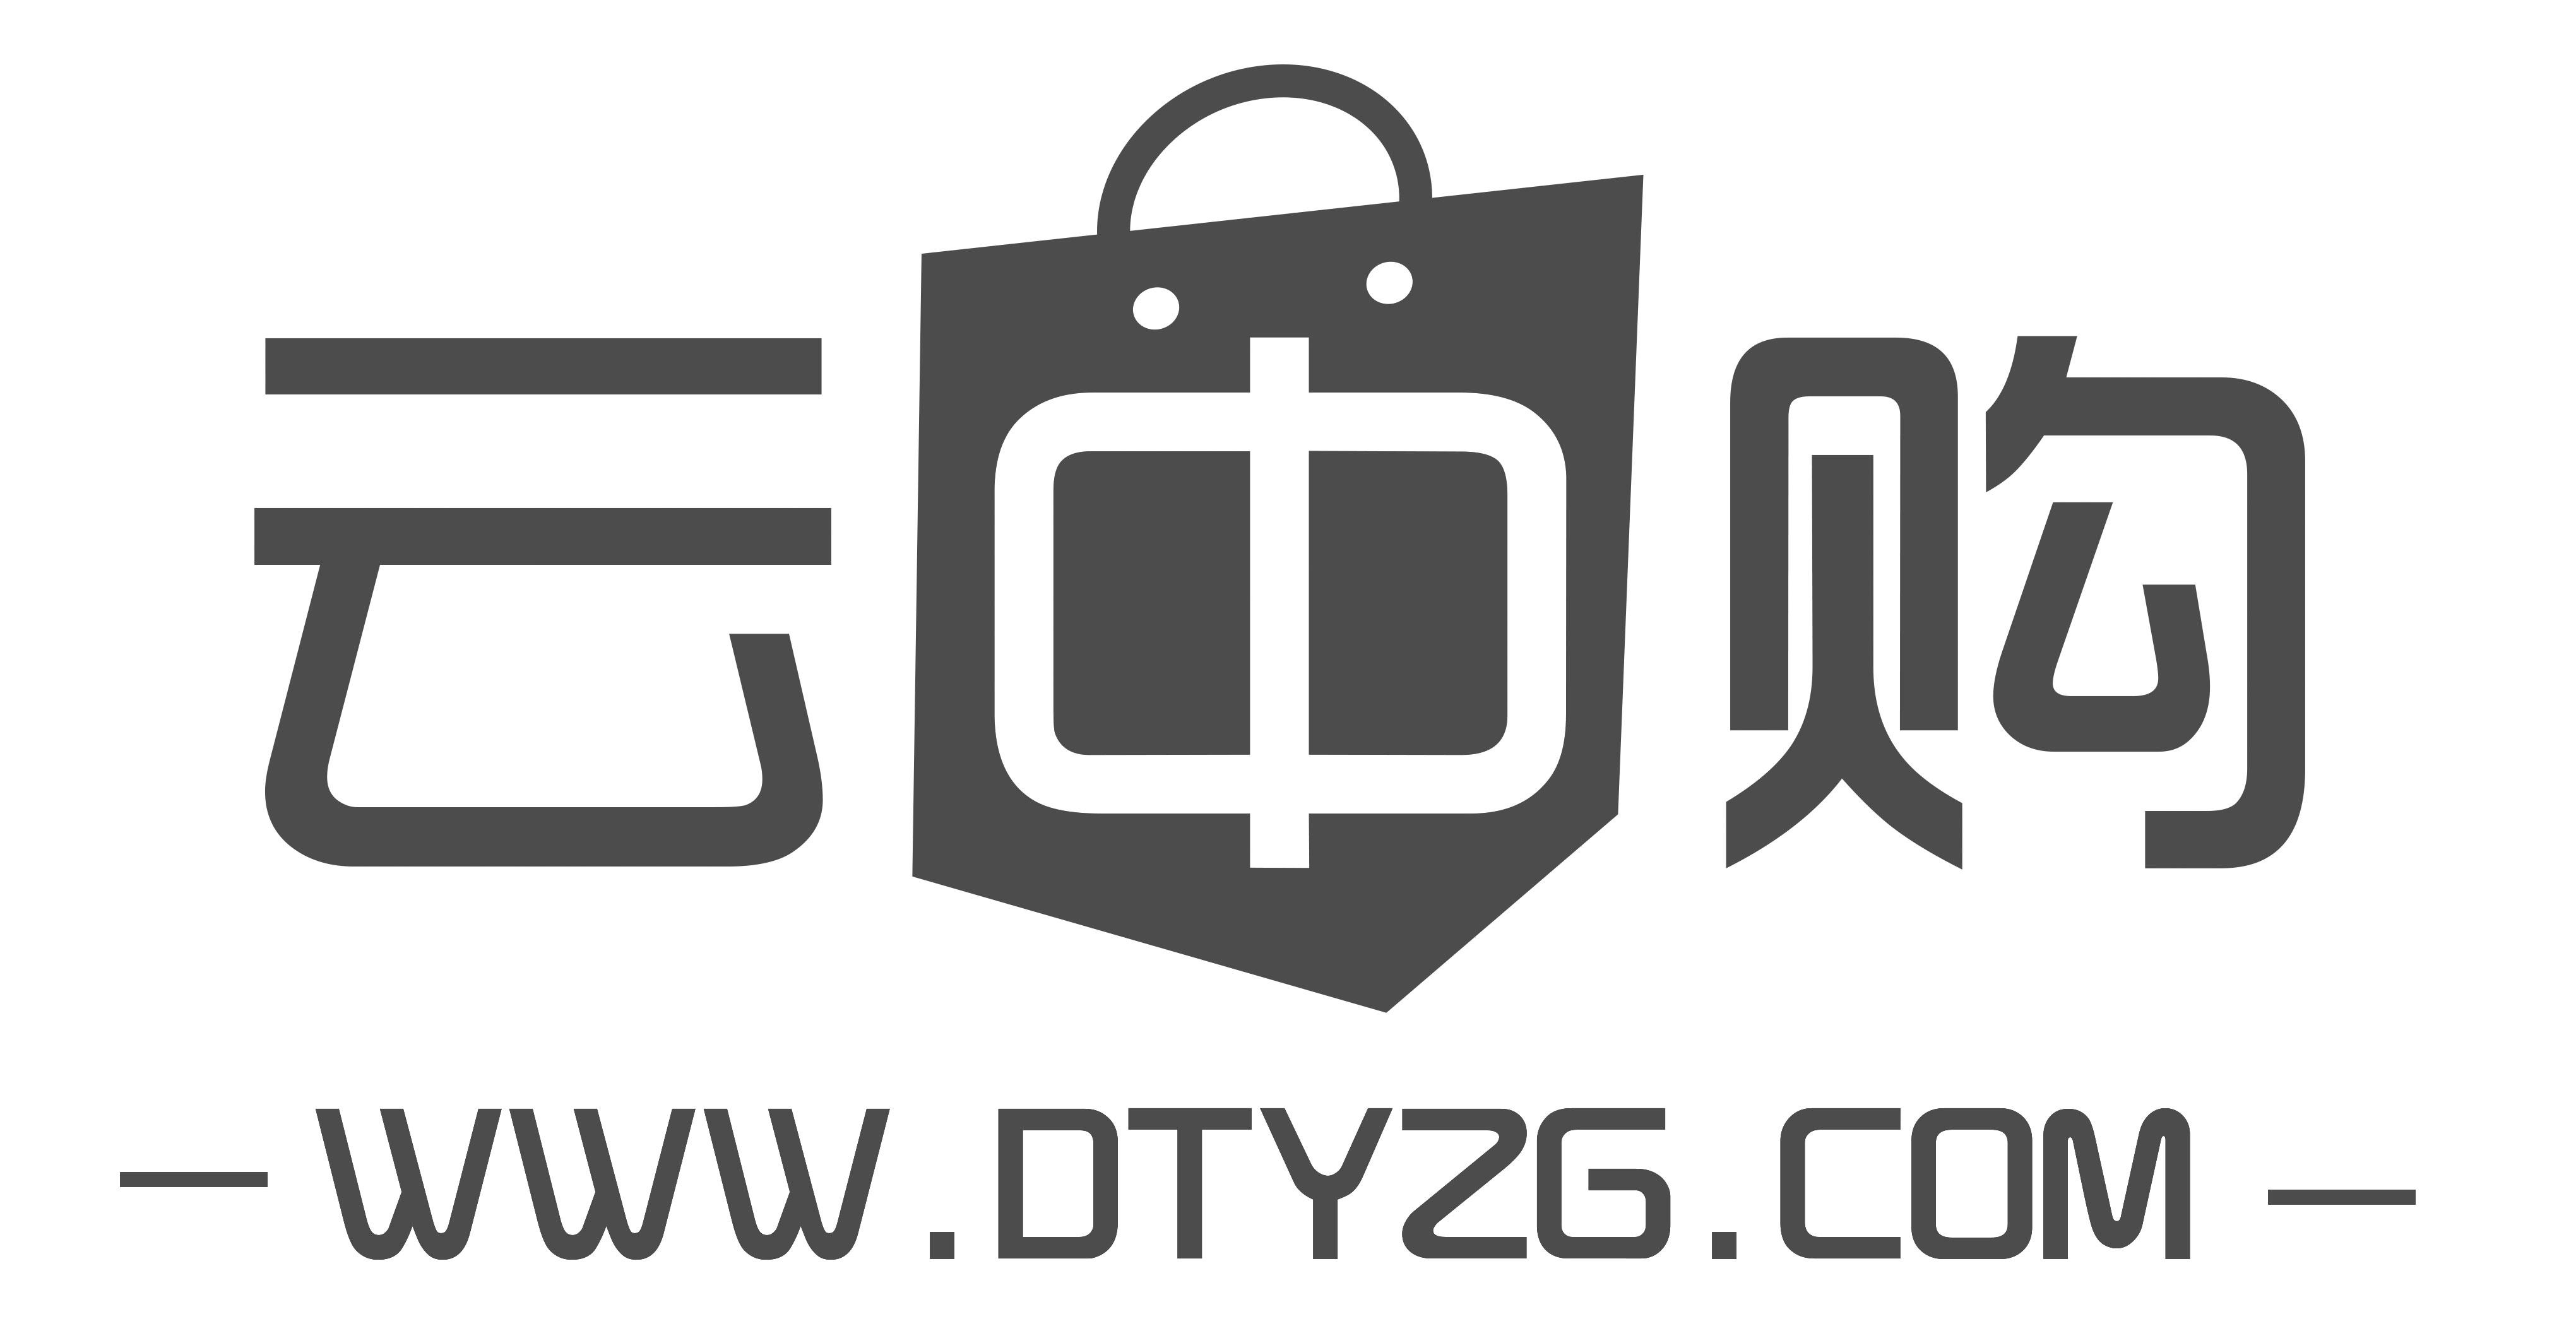 http://www.dtyzg.com/shop_list/i_1_4907_4_49070403.html